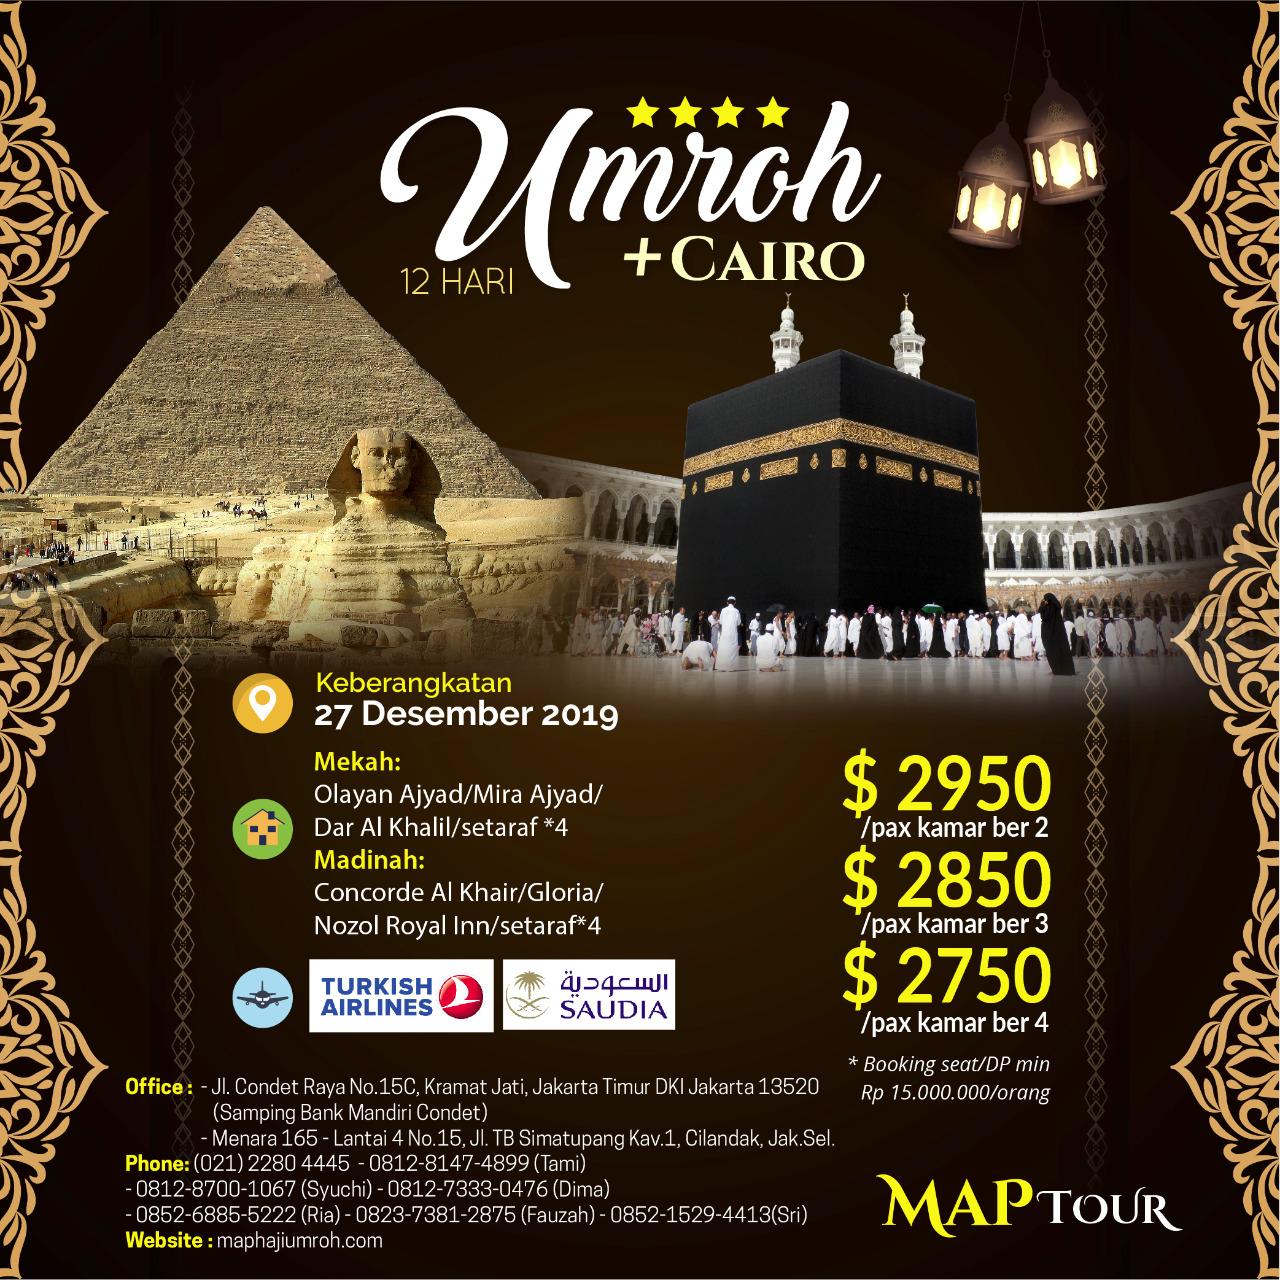 Banner Umroh Plus Cairo MAP Tour